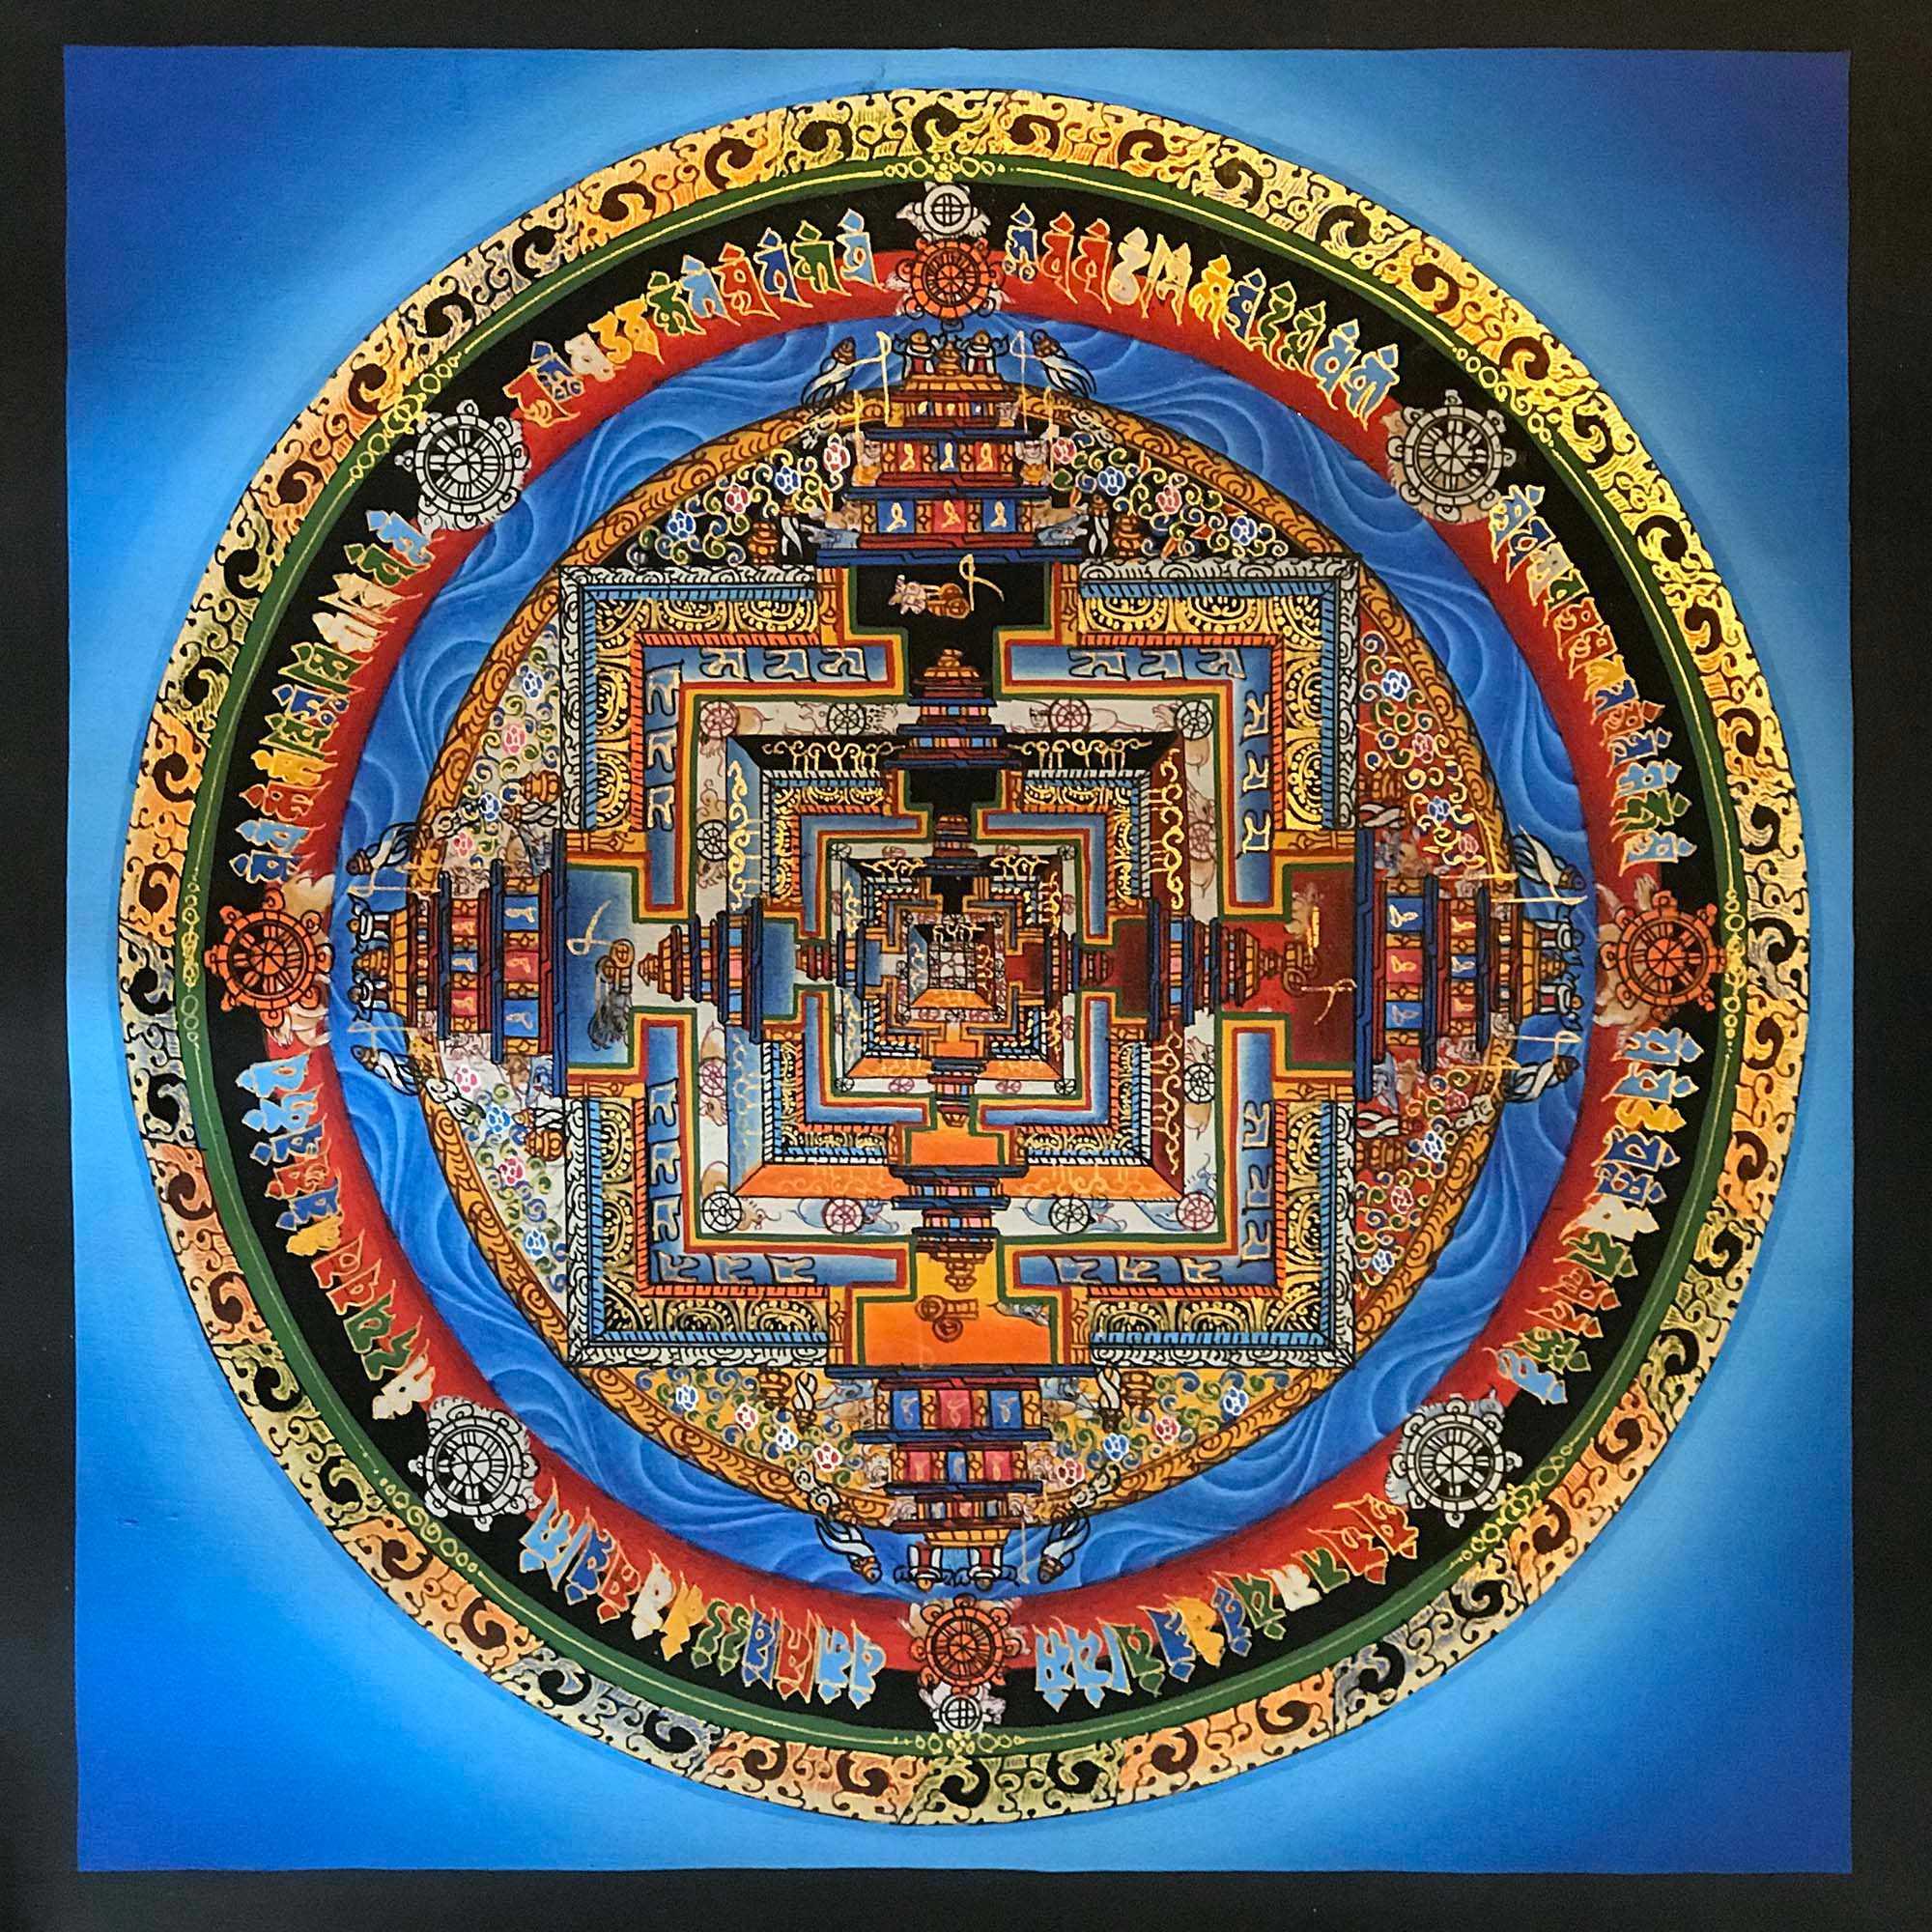 Ritual Art of Kalachakra